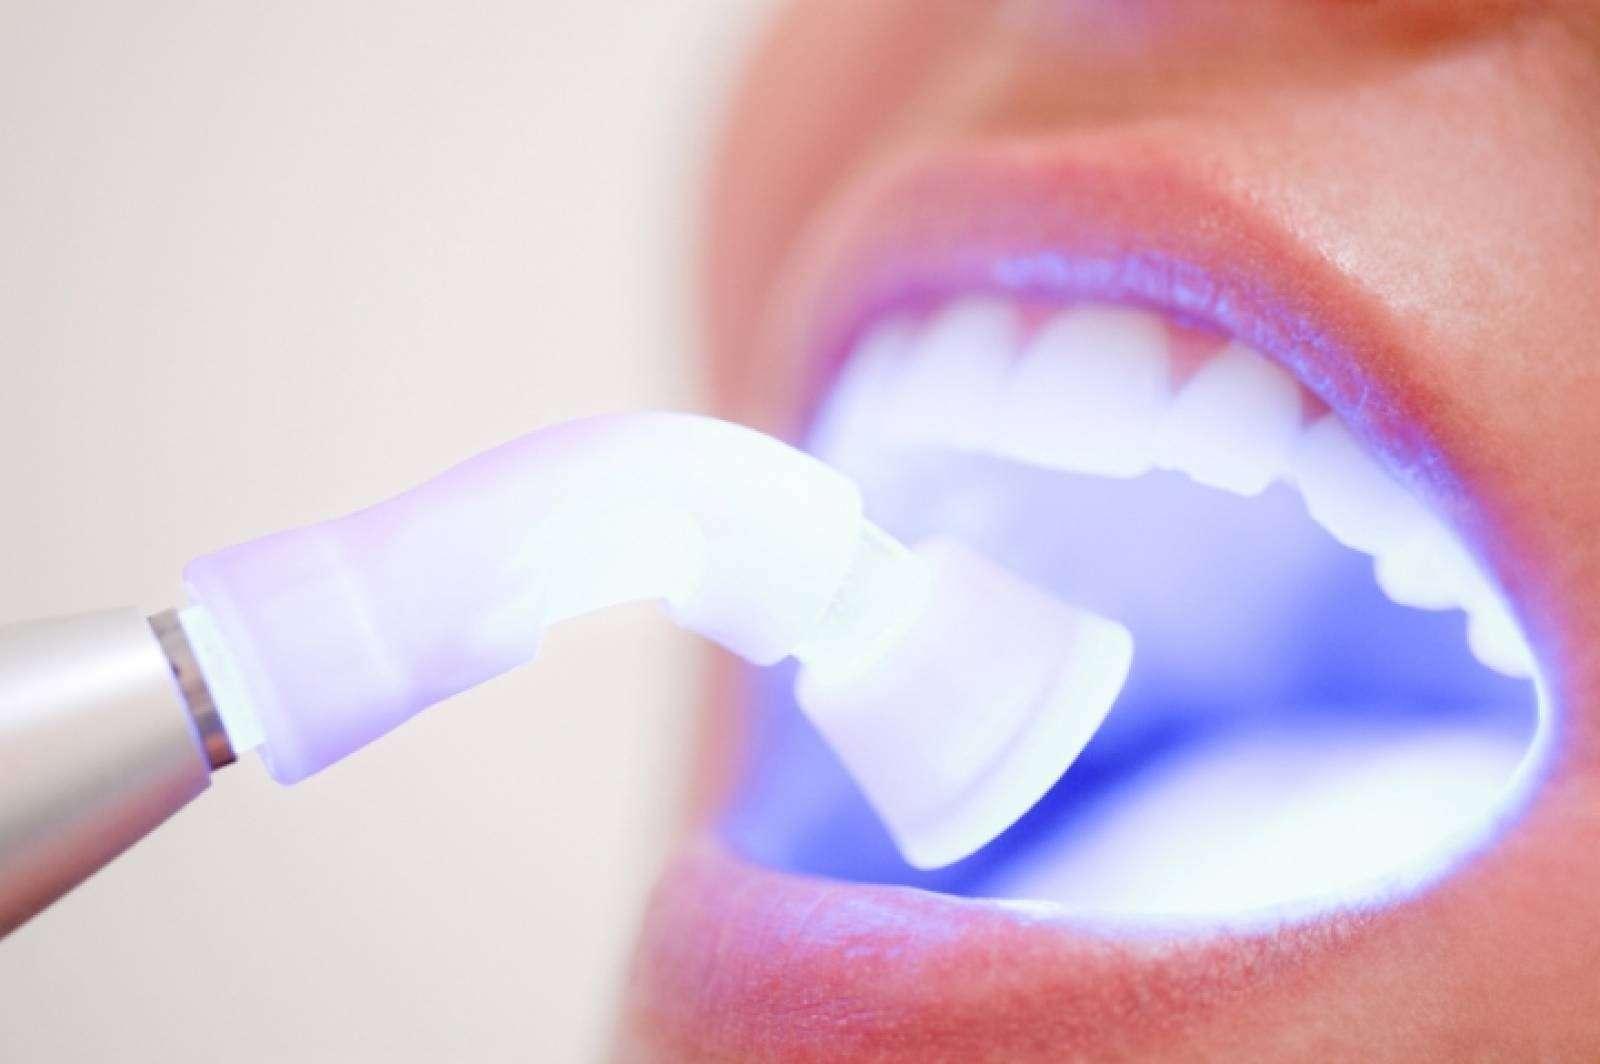 Dentista Clareamento Ideal Odonto